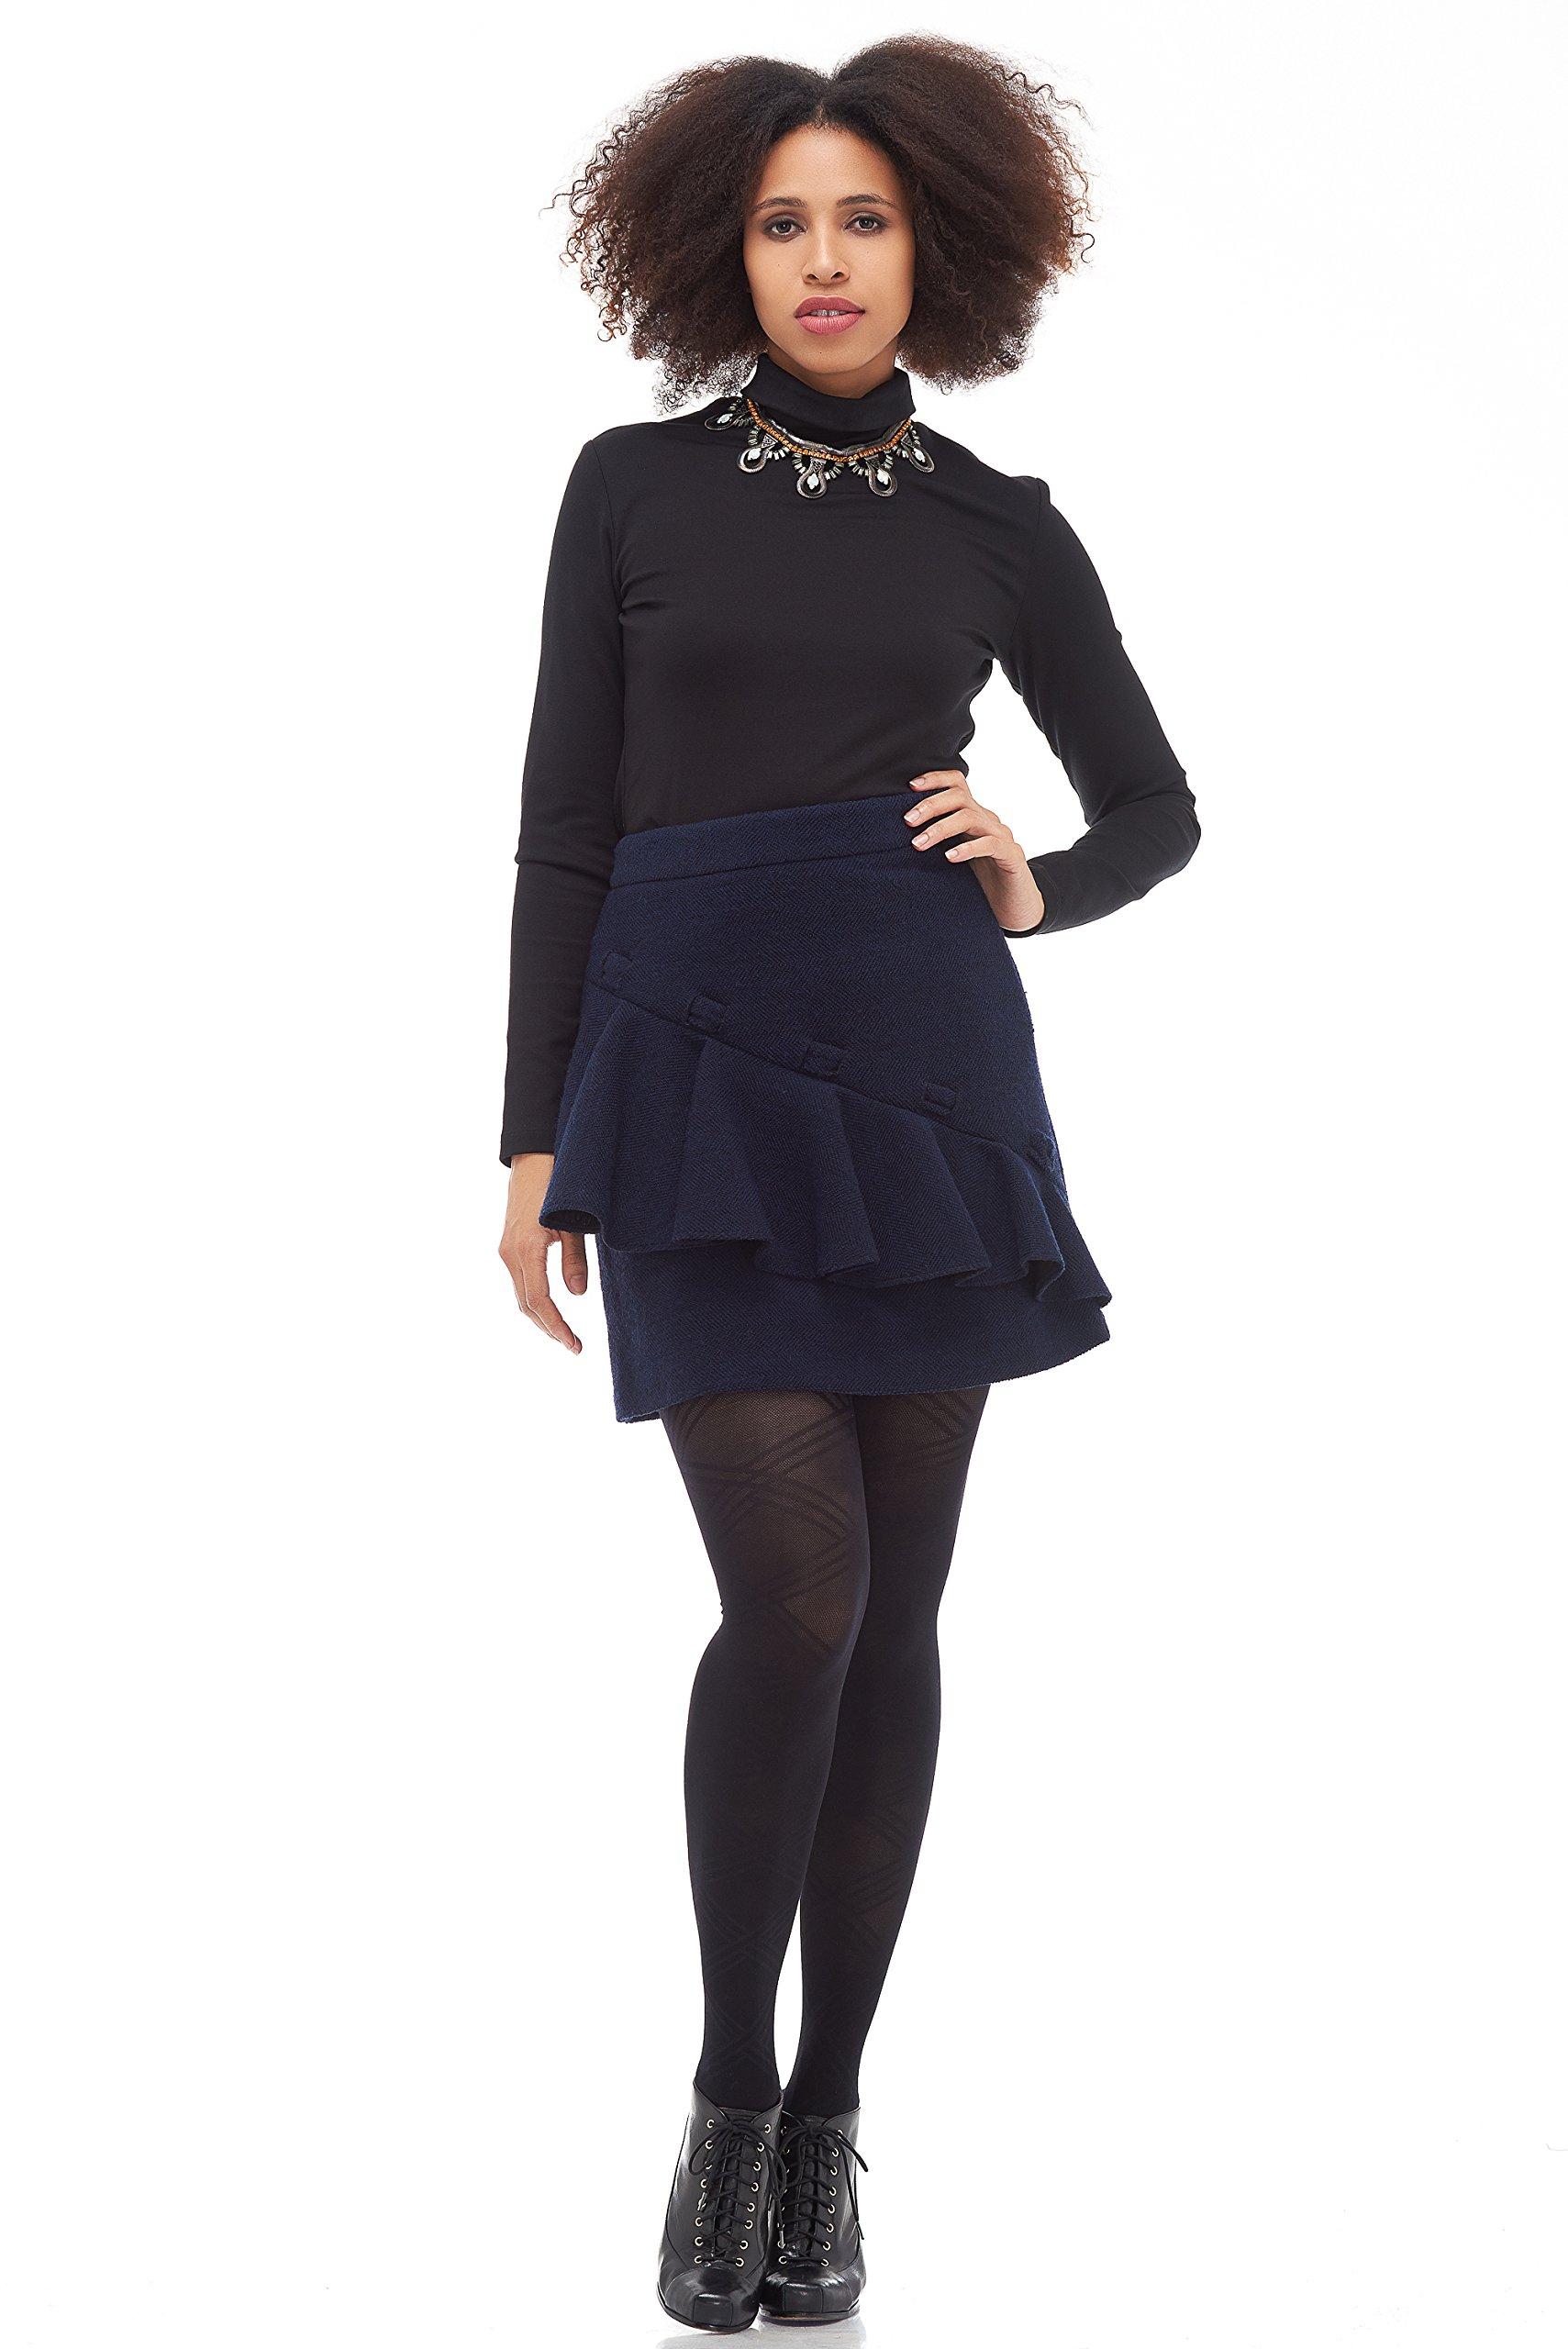 CULTRO Women's - Lucy Ruffle Short Skirt